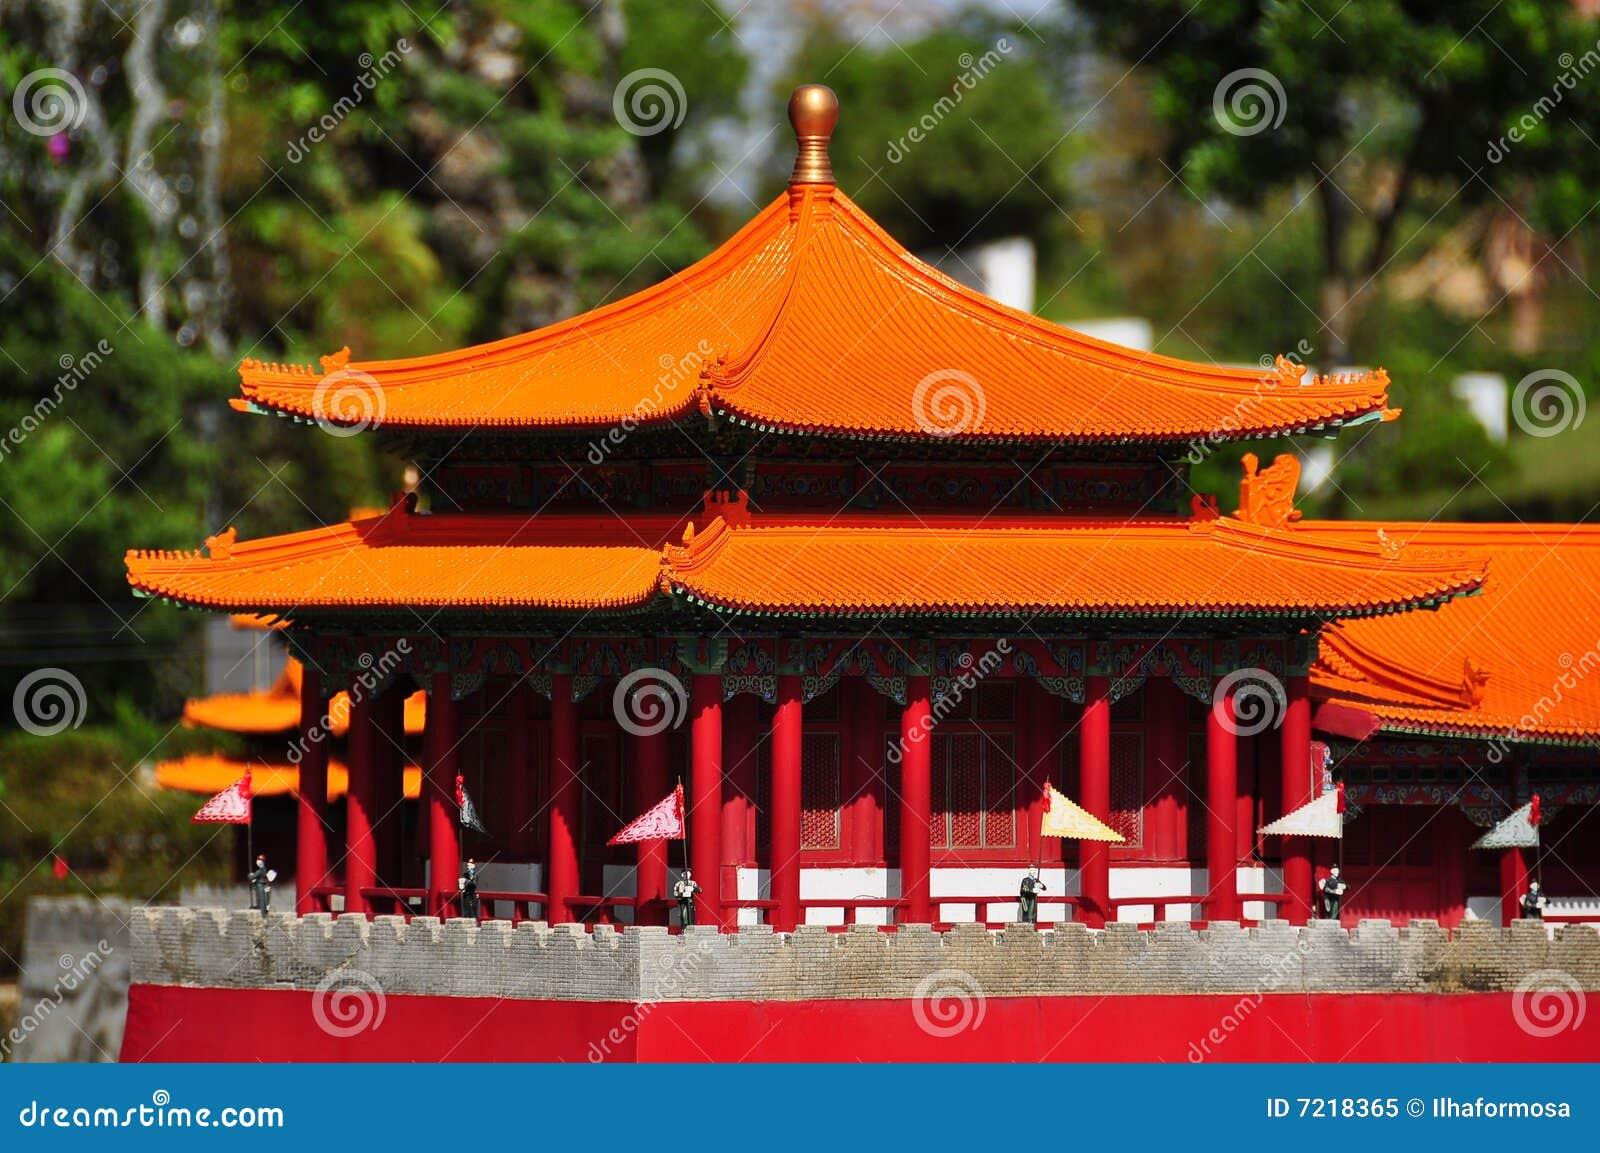 Miniature Chinese Pagoda Stock Image Image Of Pavilions